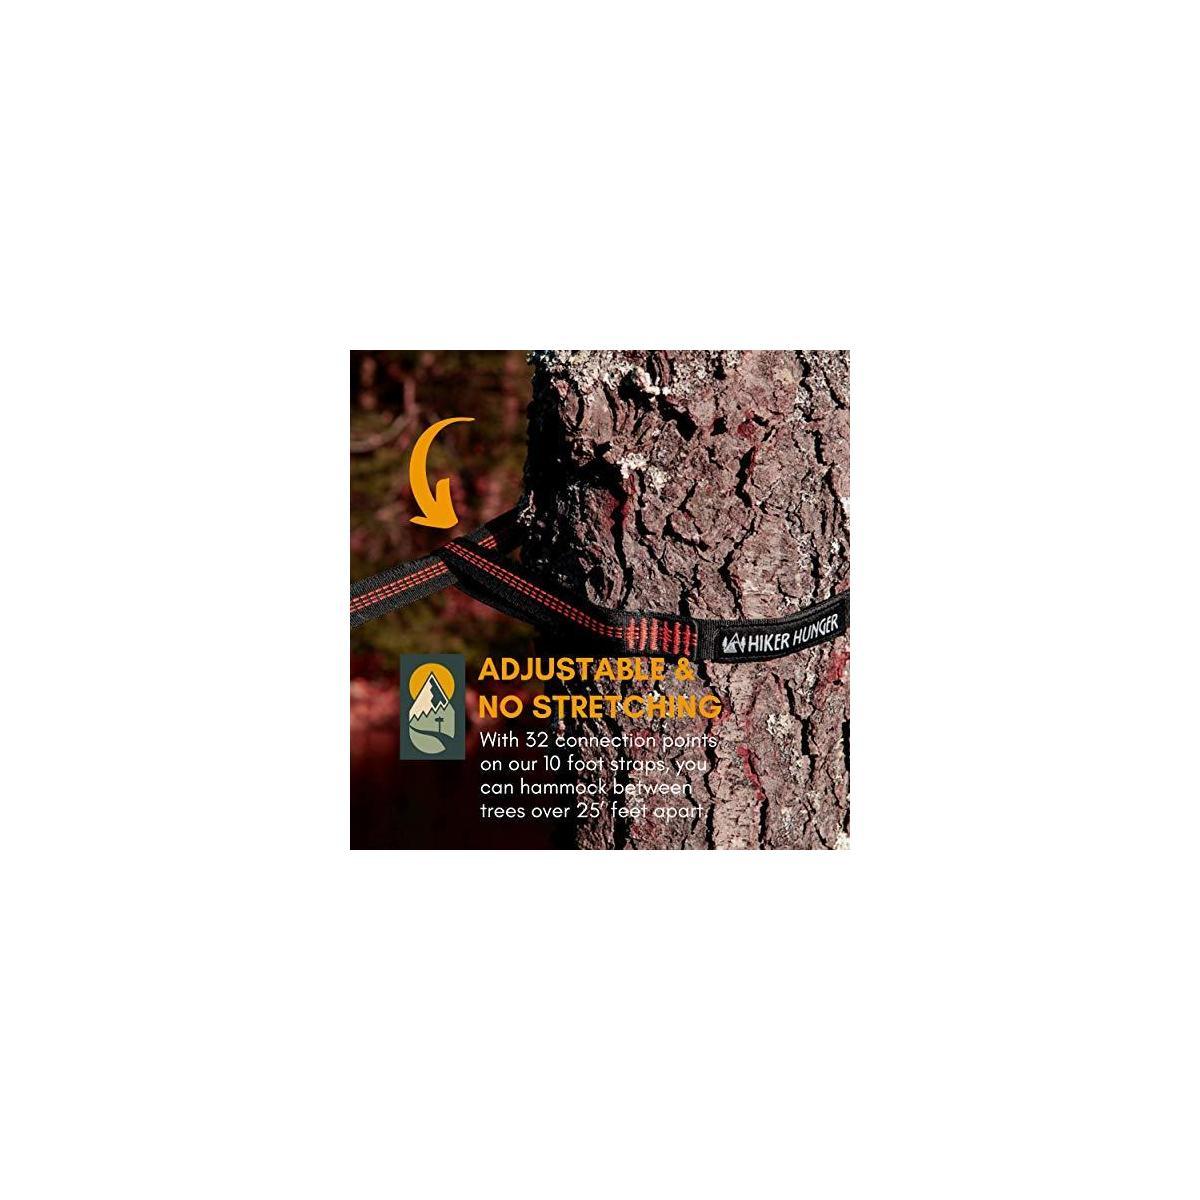 Hiker Hunger XL Hammock Tree Straps Combined 20' to 28' Feet w/ 2200 LBS Breaking Strength – No Stretch Suspension Set - Long, Heavy Duty, Ultra Lightweight w/Flat Adjustable Loops